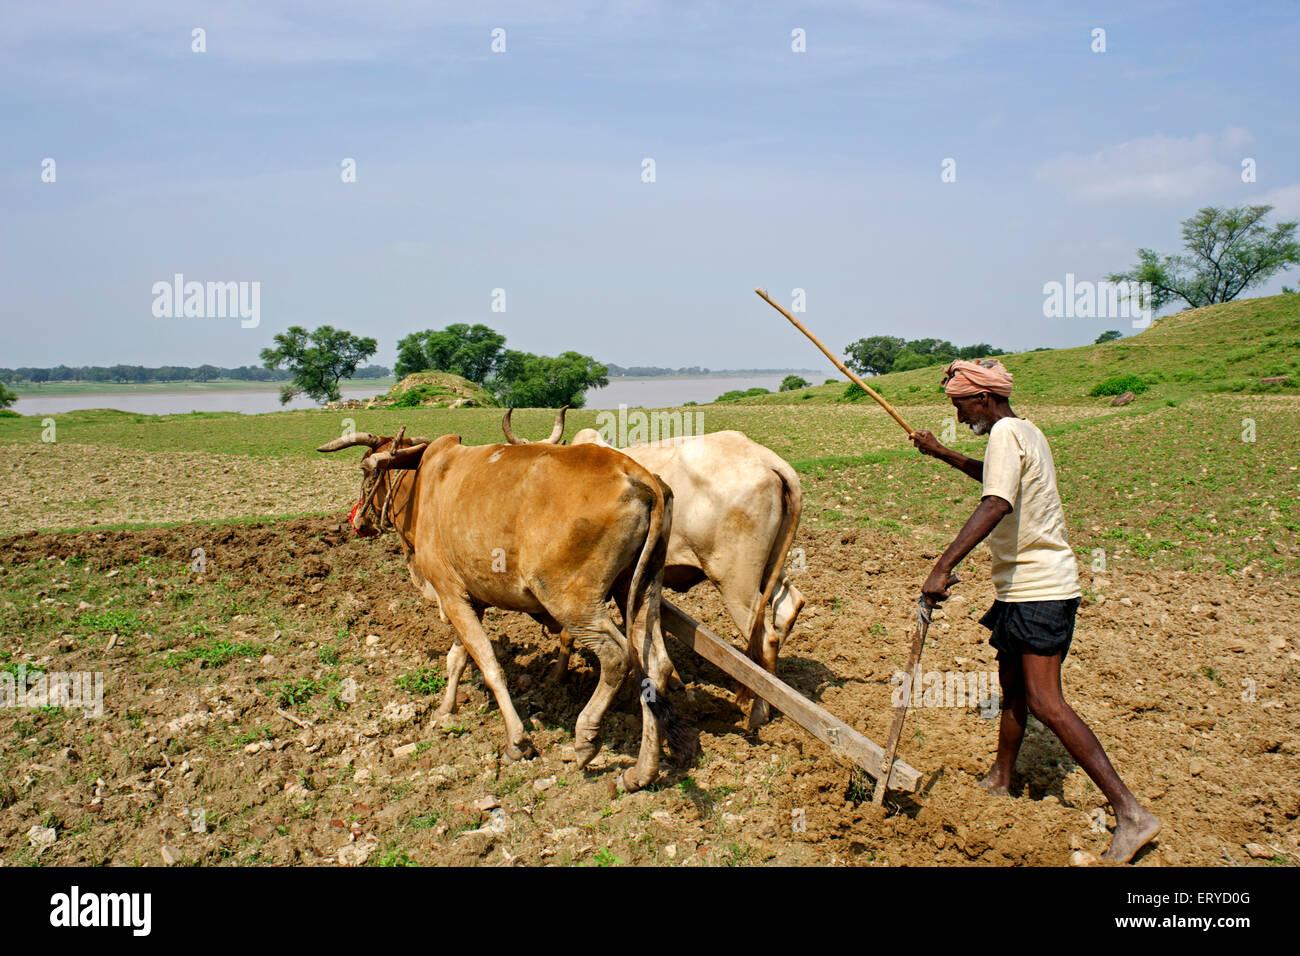 Agricoltore aratura terreni ; Kaushambi 60km da Allahabad ; Uttar Pradesh ; India Immagini Stock